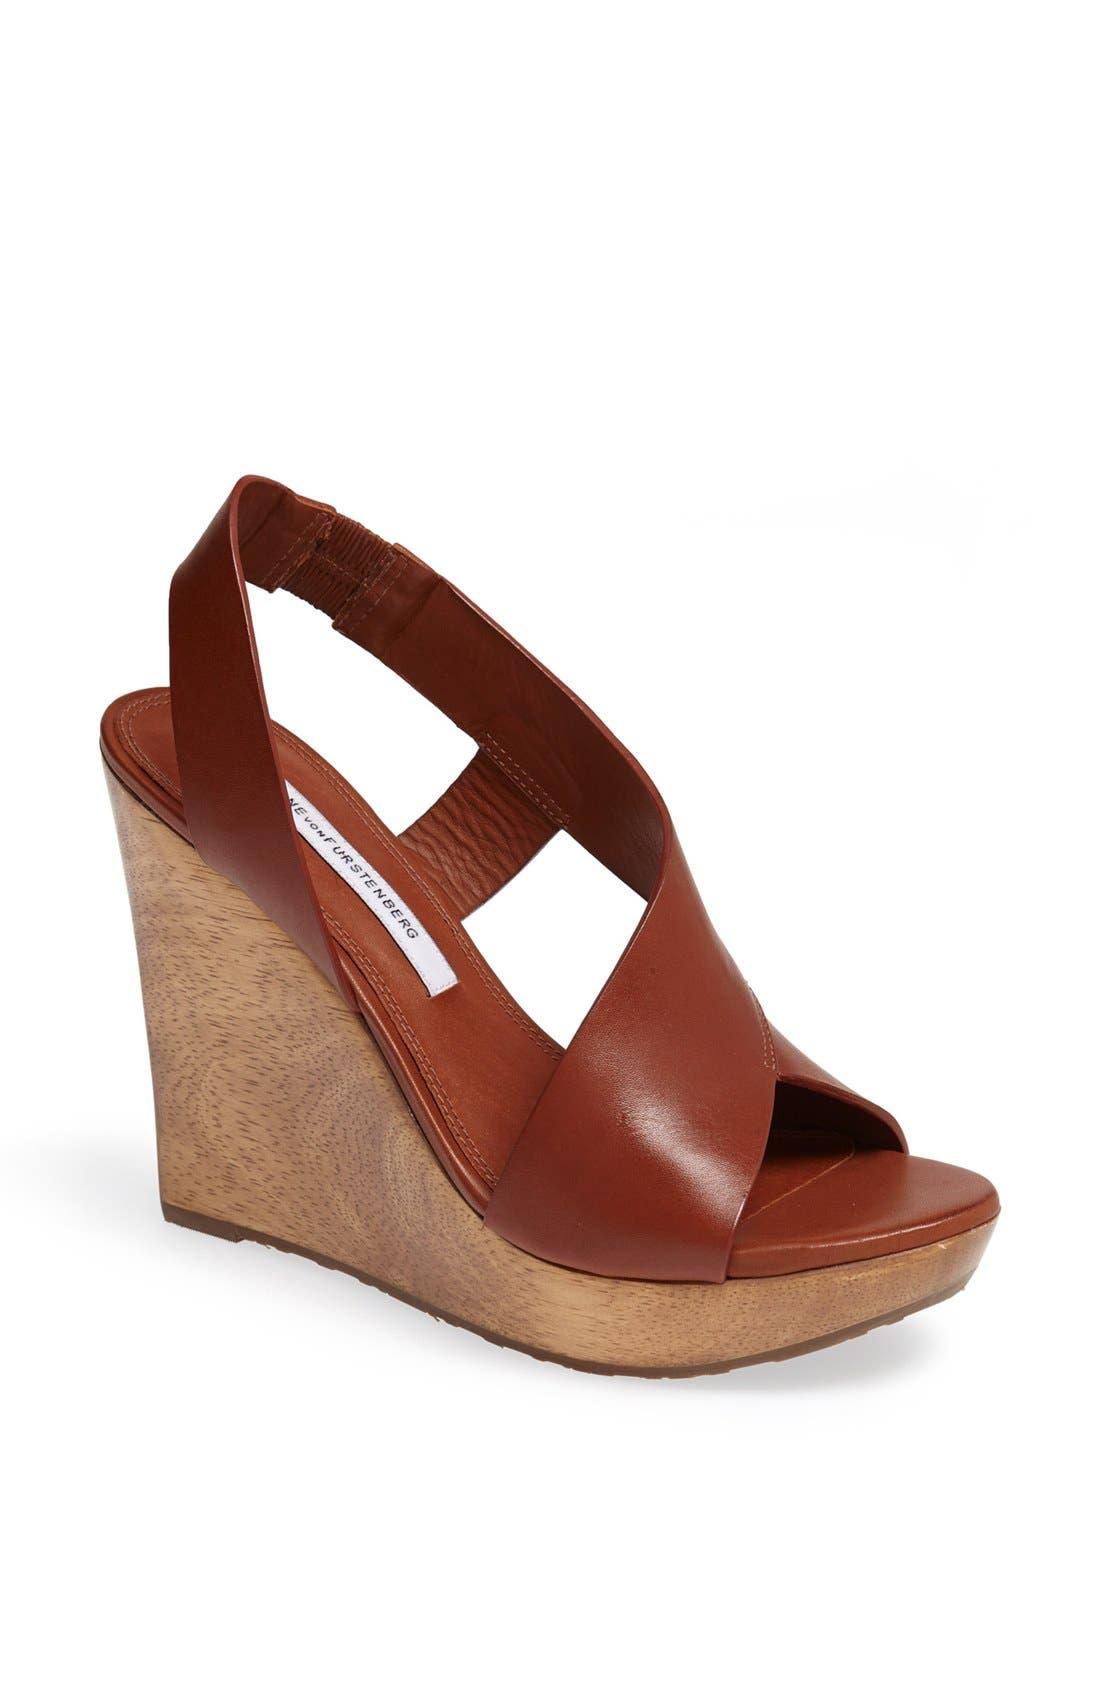 Alternate Image 1 Selected - Diane von Furstenberg 'Sunny' Wedge Sandal